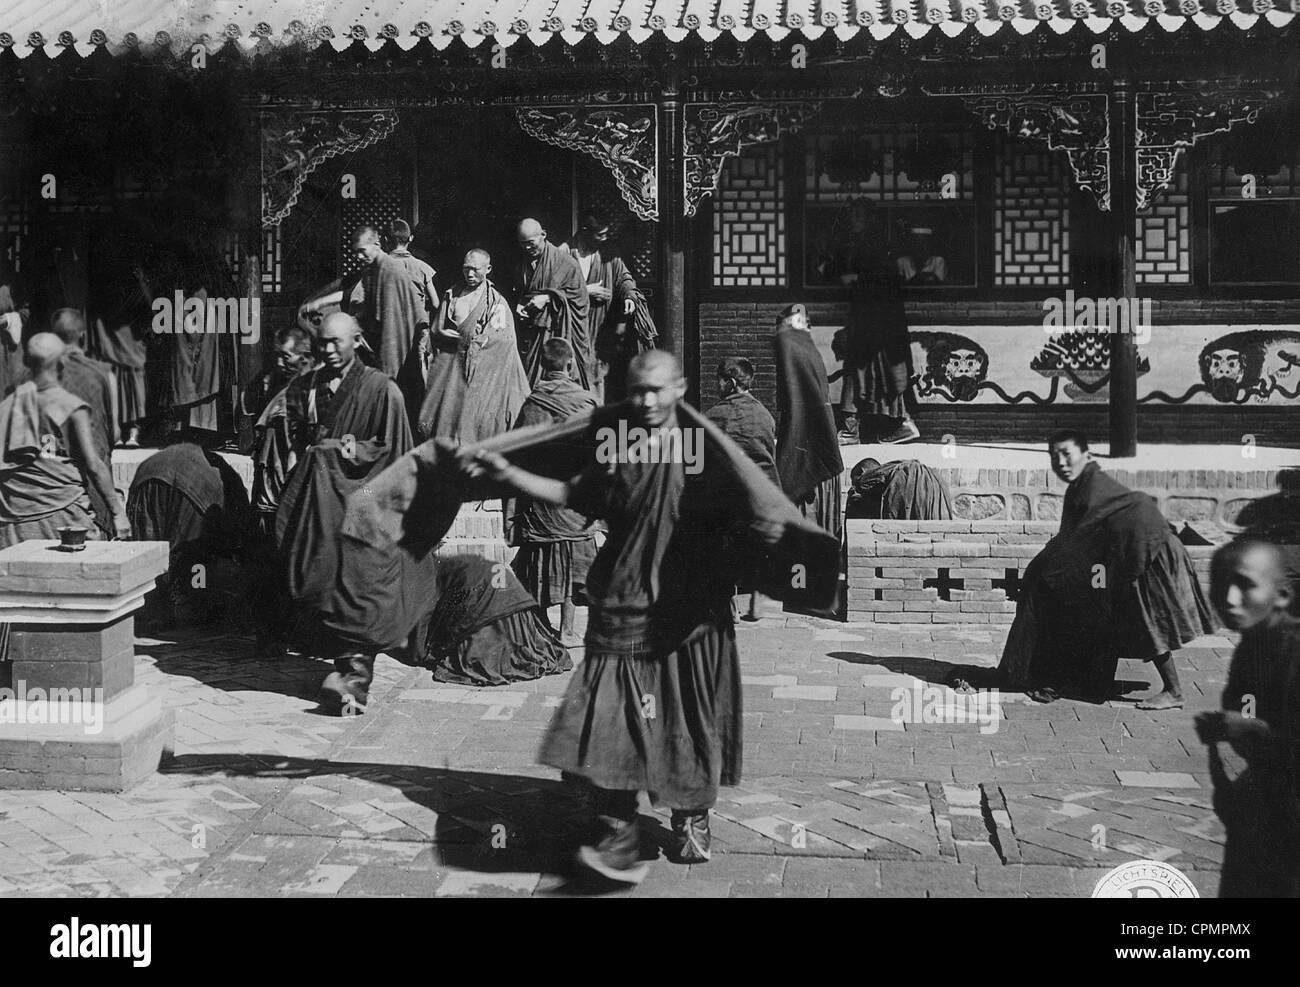 Priest of the Lamaism (Tibetan Buddhism) - Stock Image